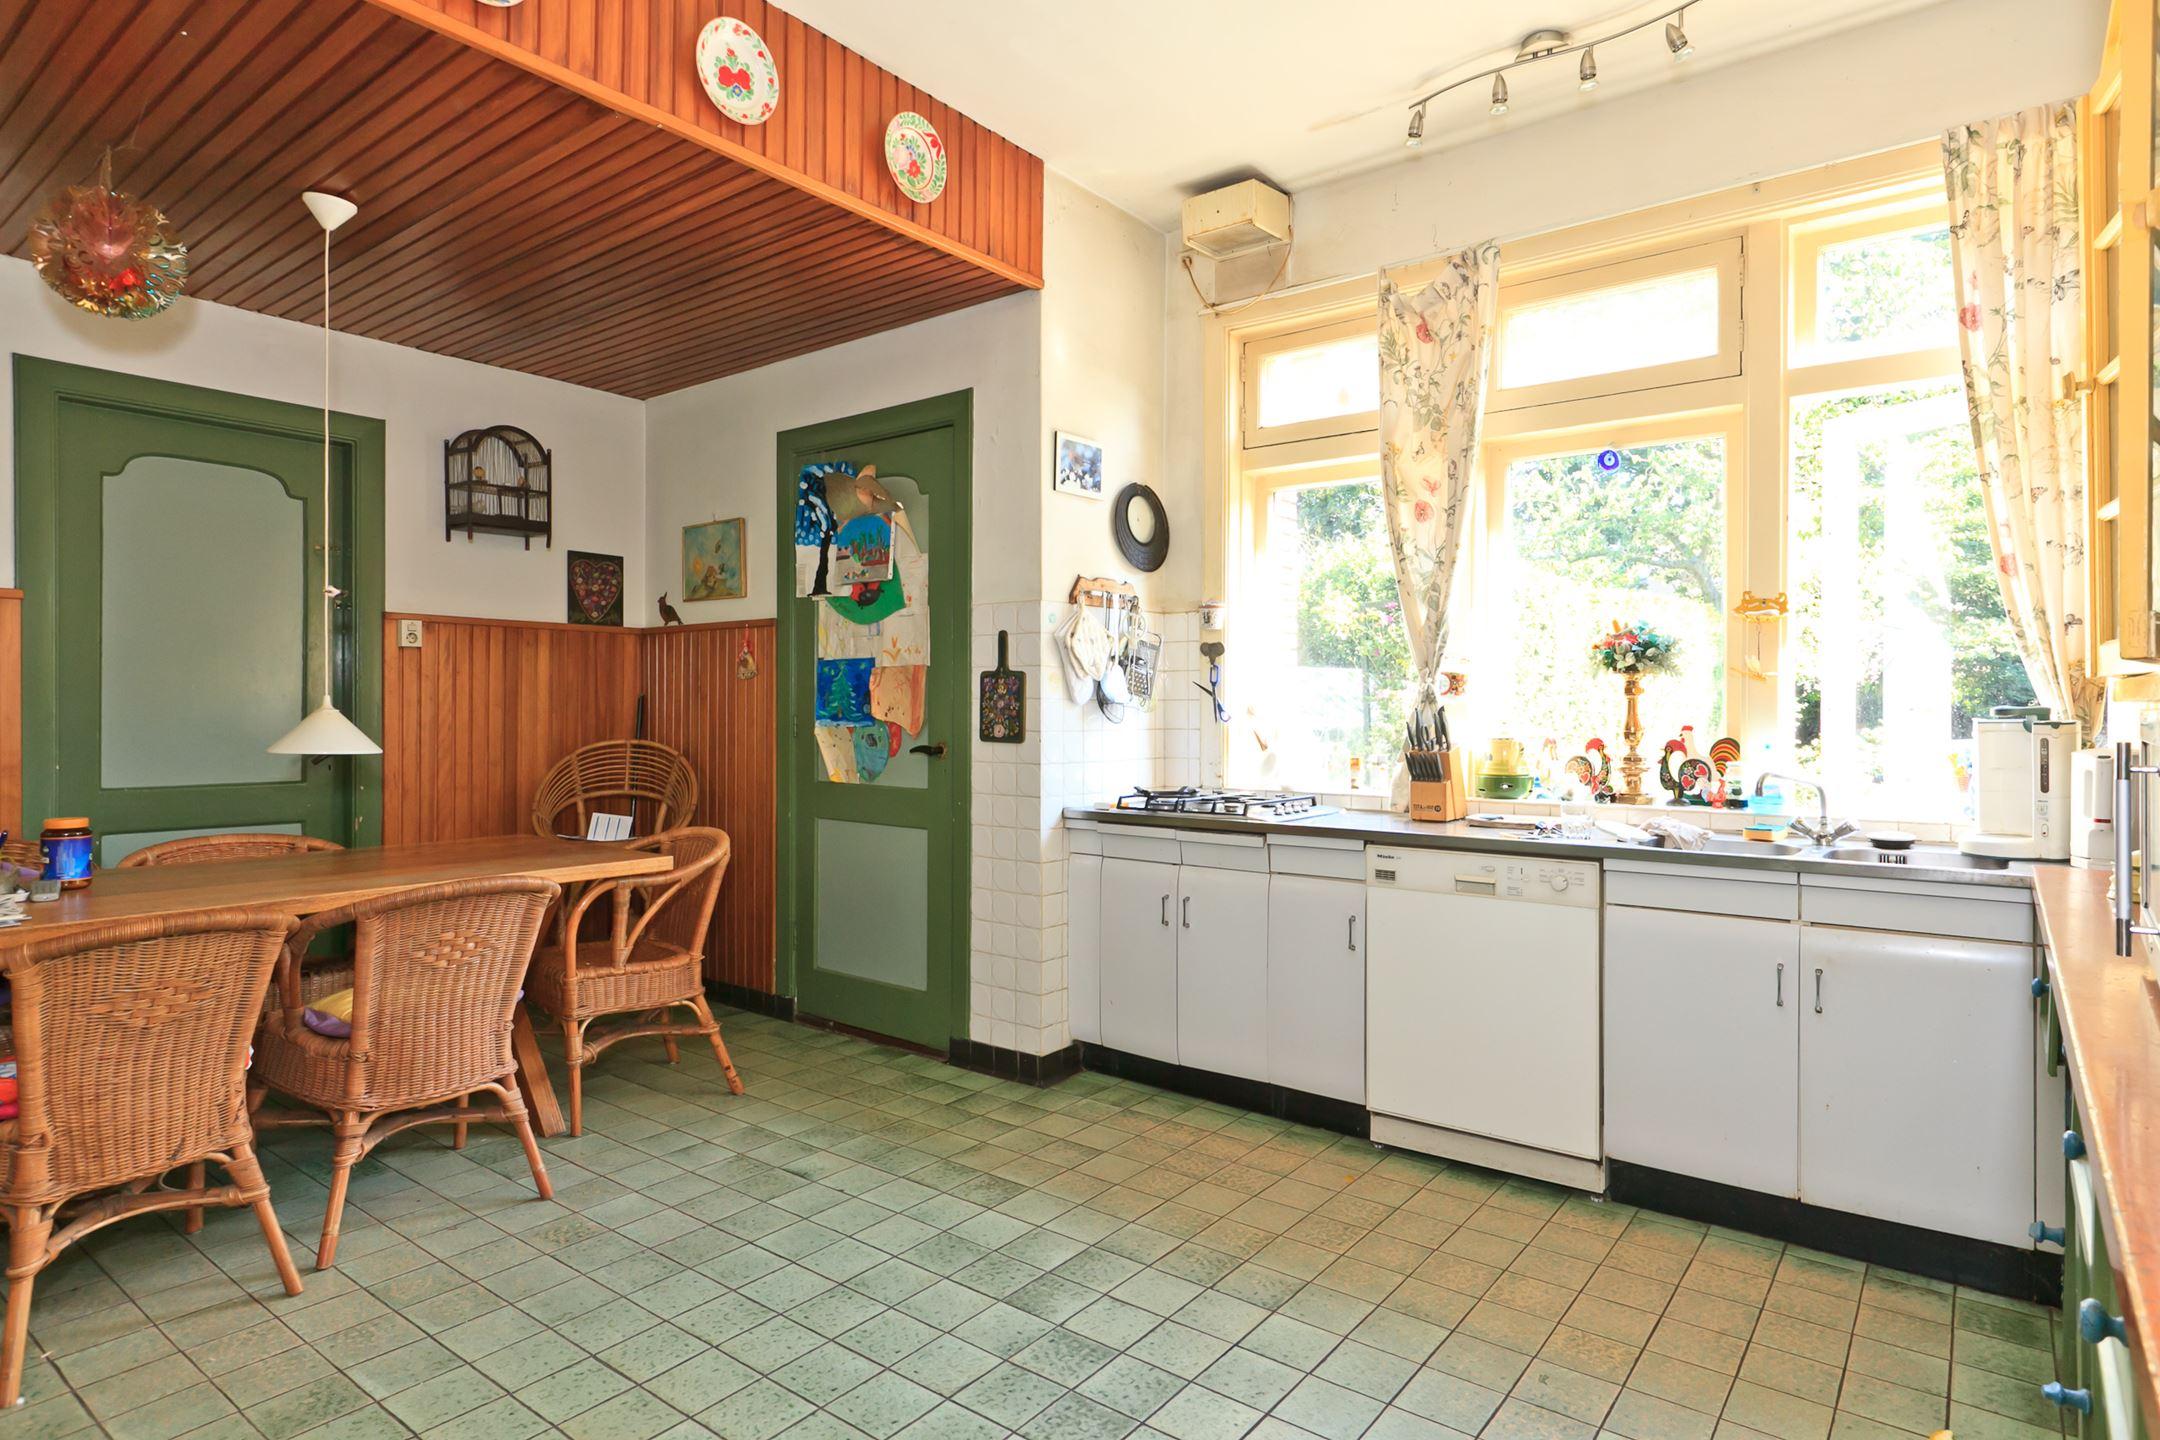 Huis te koop: Oranje Nassaulaan 18 2361 LE Warmond [funda]